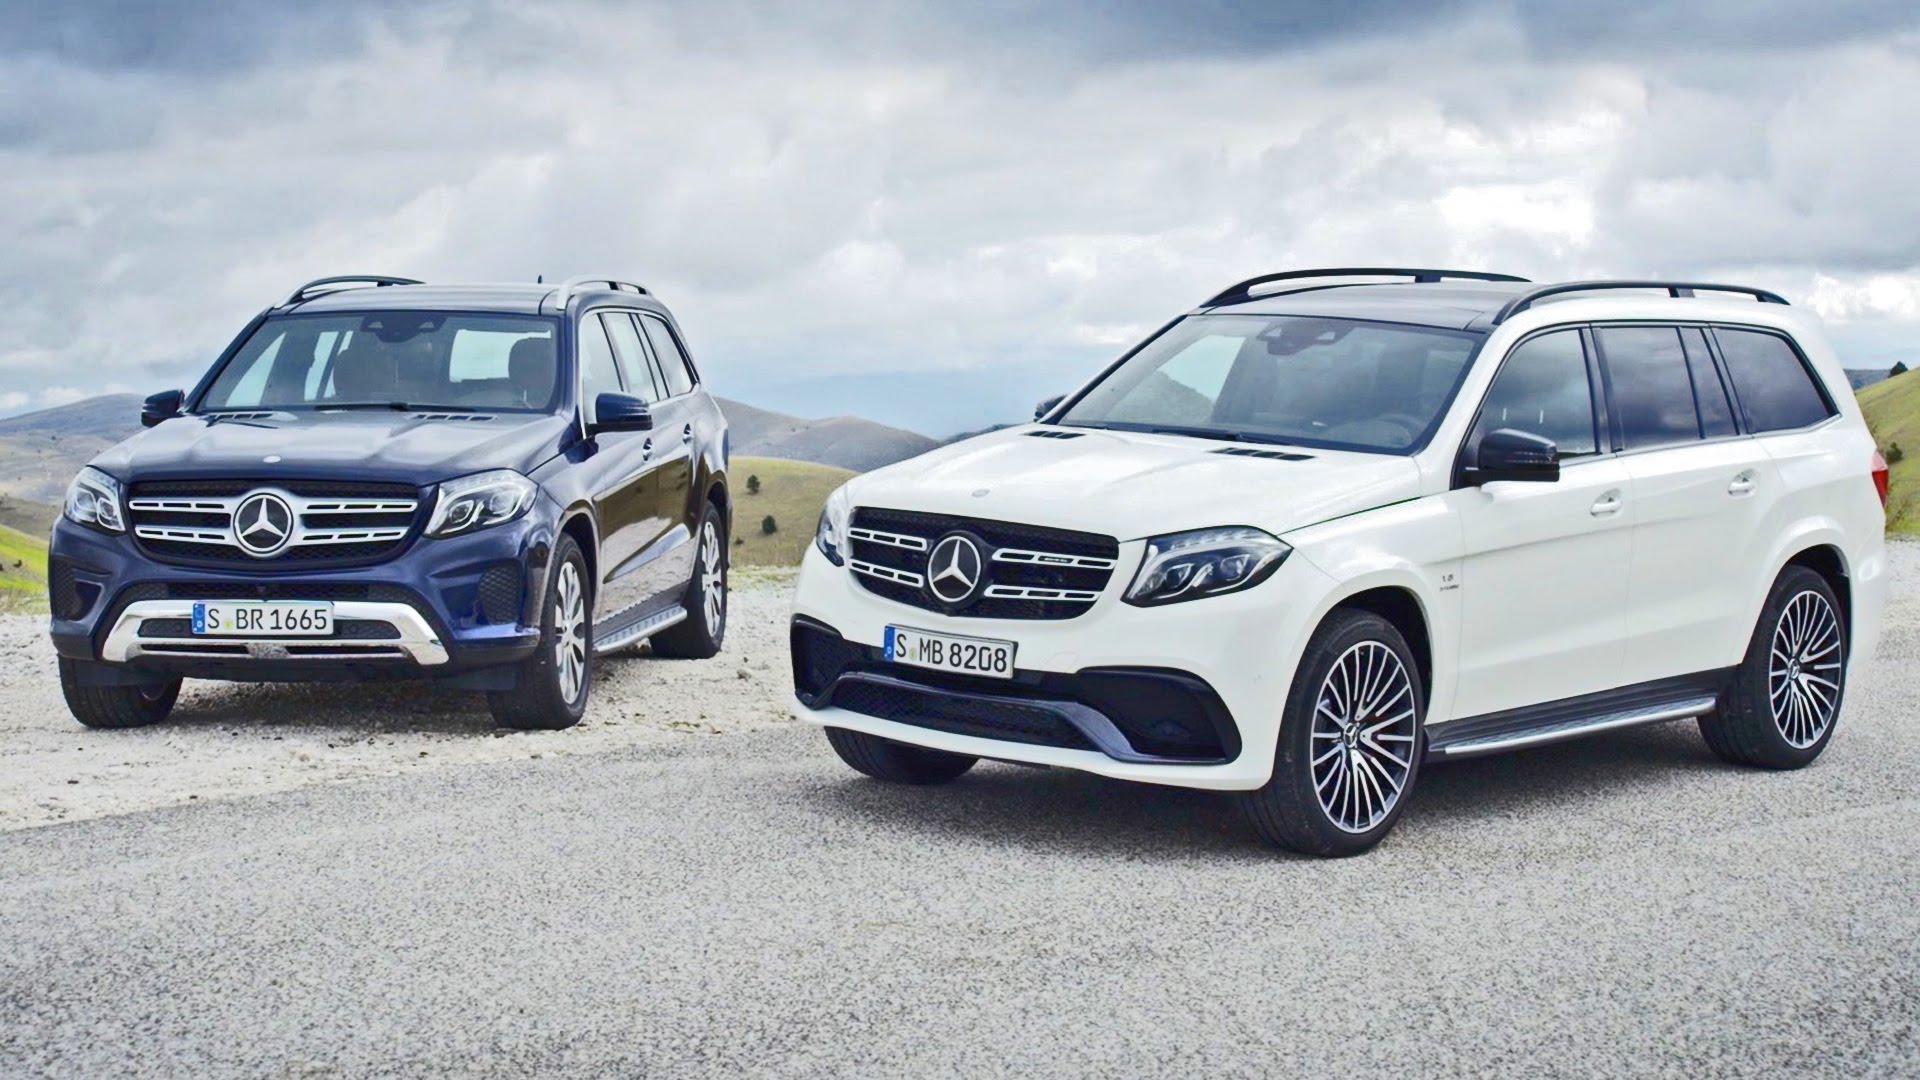 Mercedes GLS Free